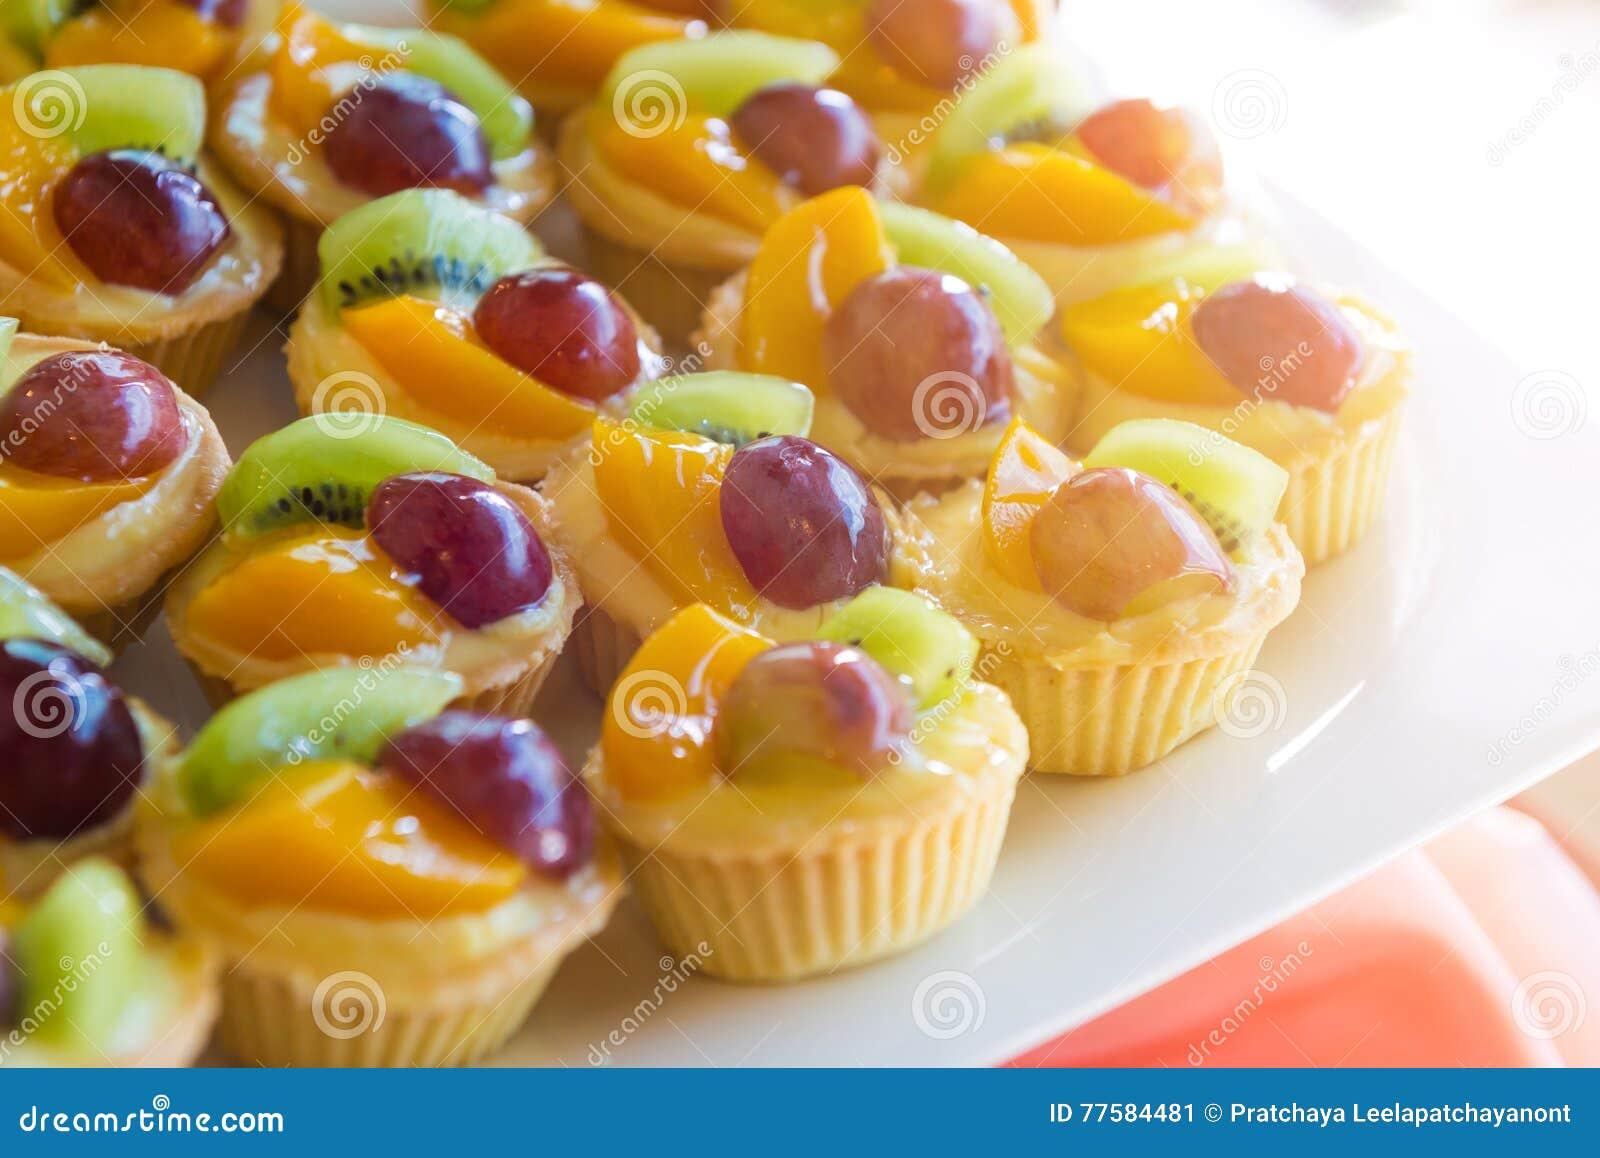 Tarta mezclada de las natillas de fruta fresca